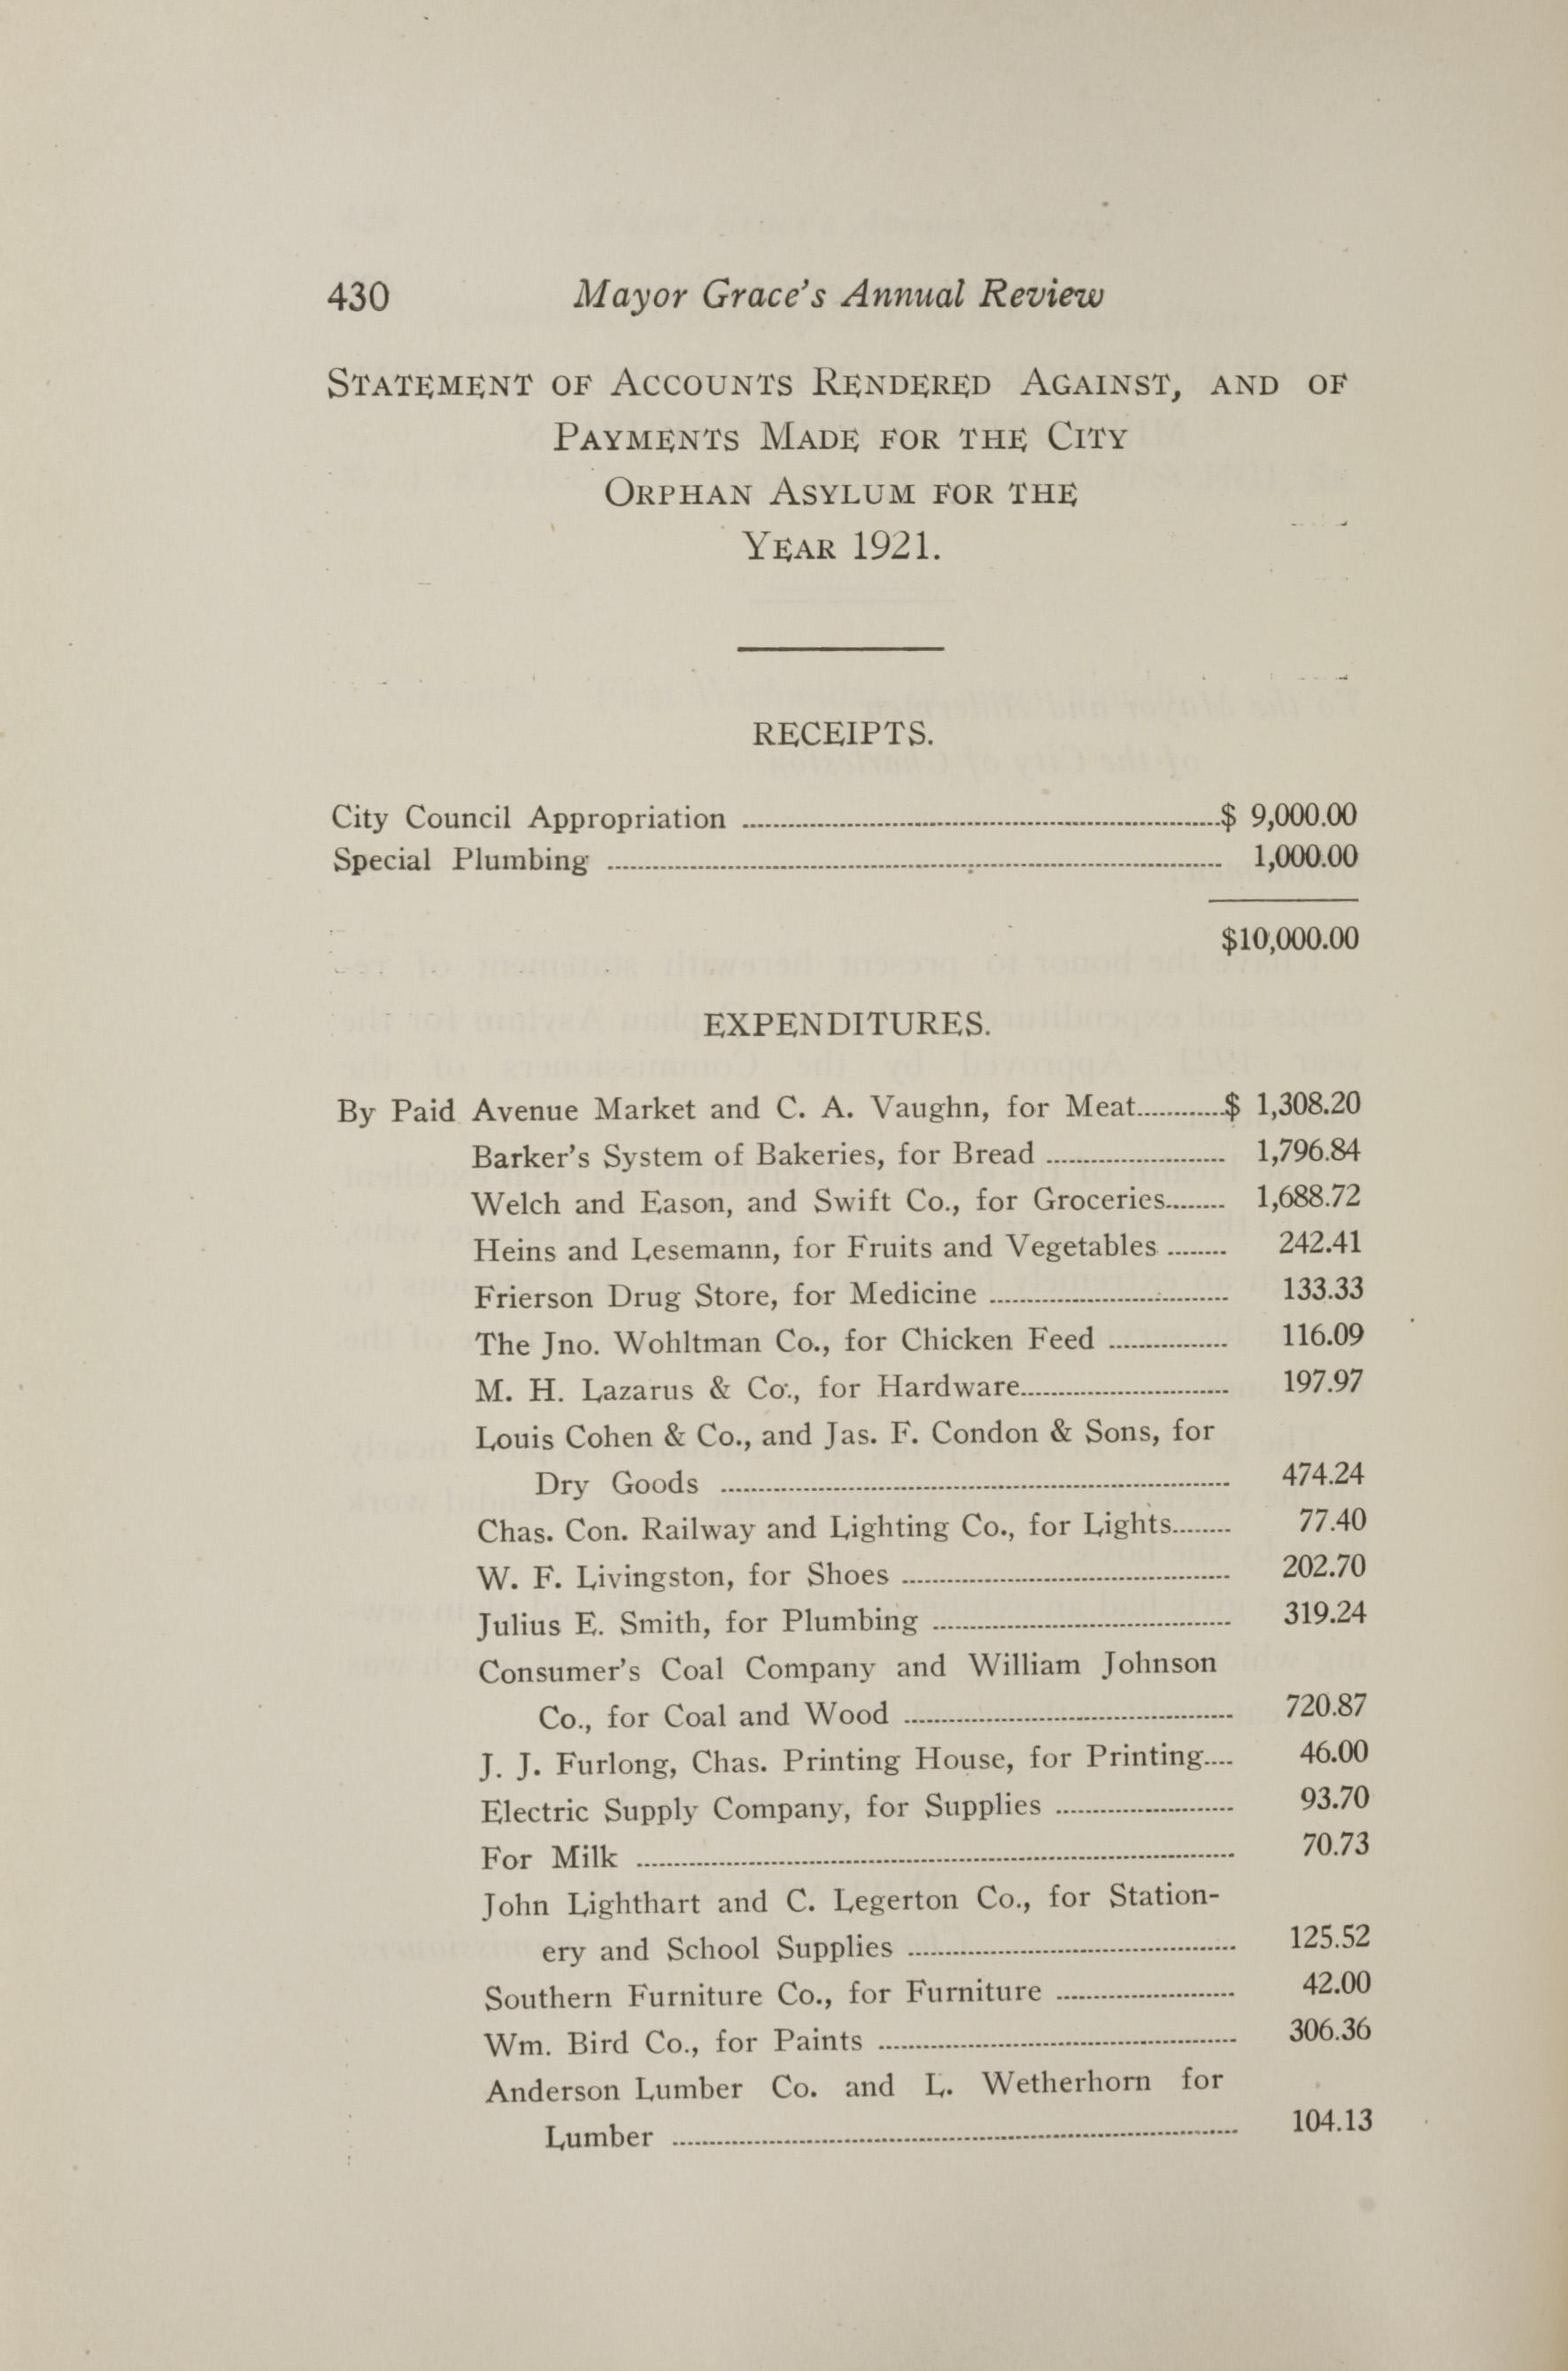 Charleston Yearbook, 1921, page 430